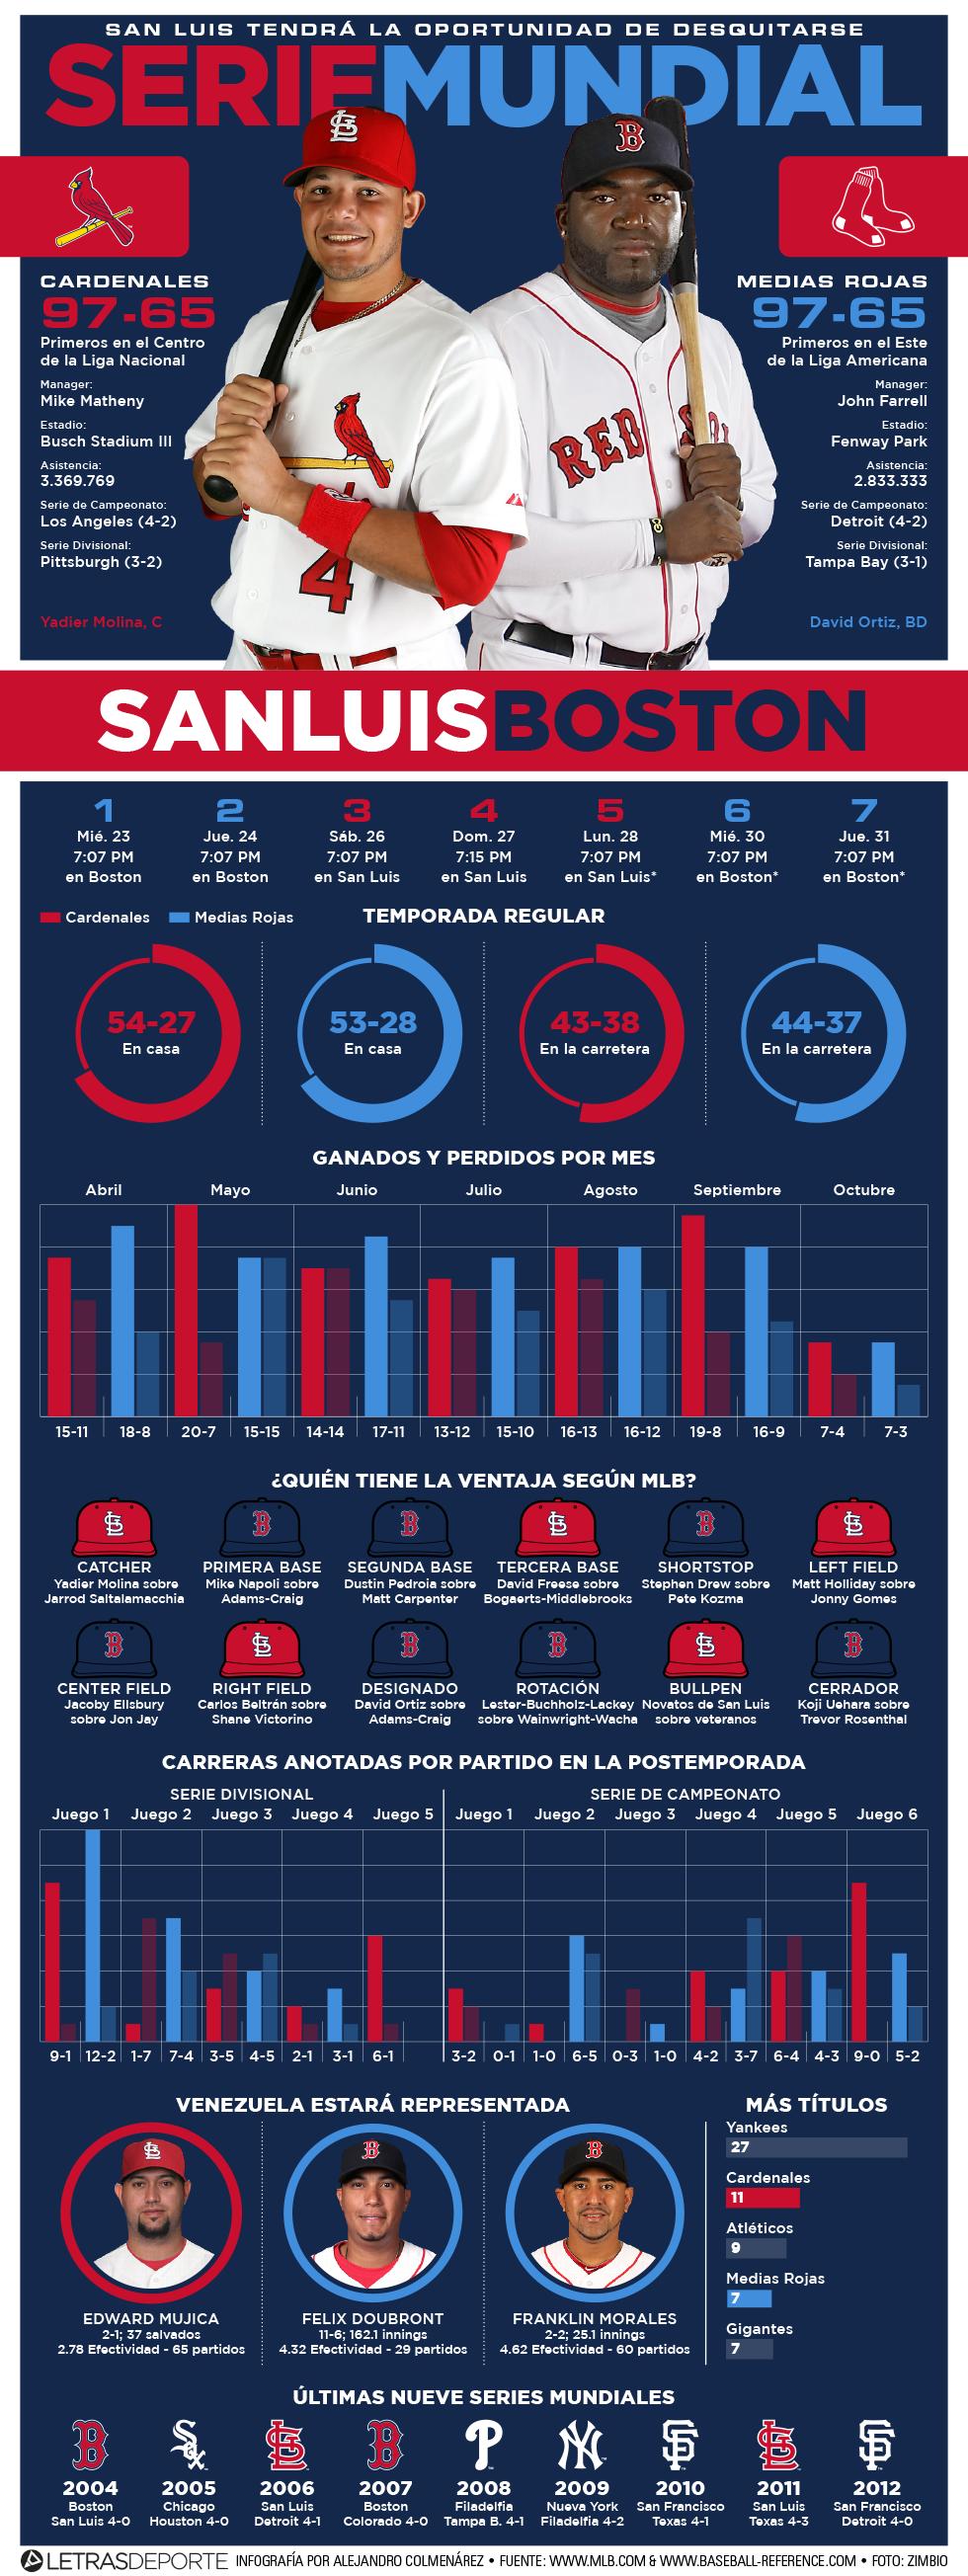 Infografía de la Serie Mundial 2013 Sna Luis-Boston